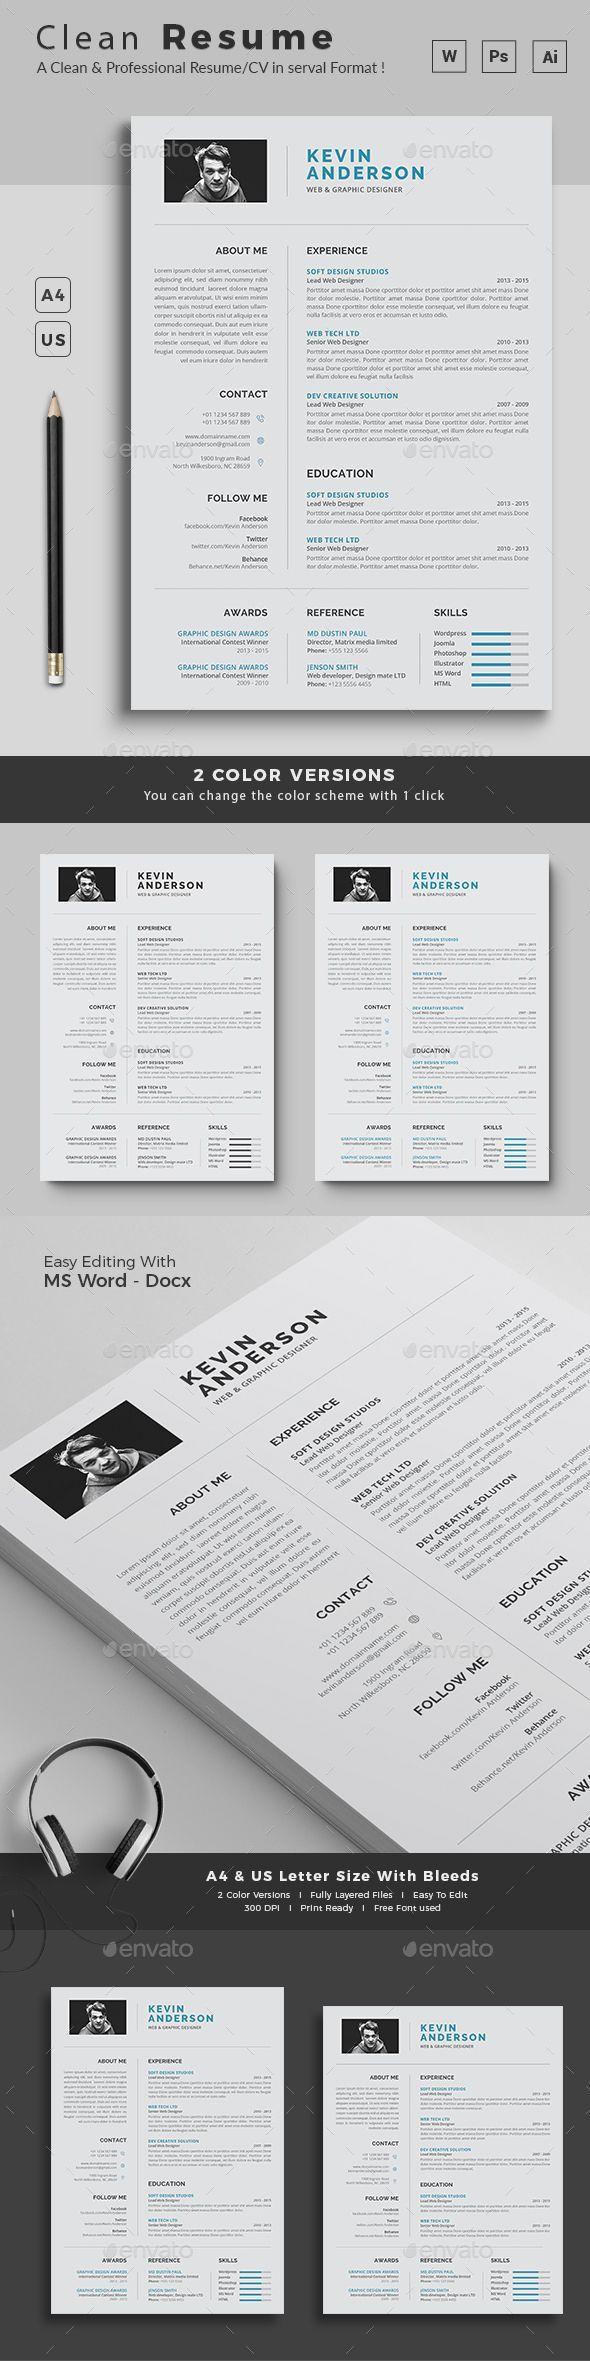 Resume cv template resume clean • Download here